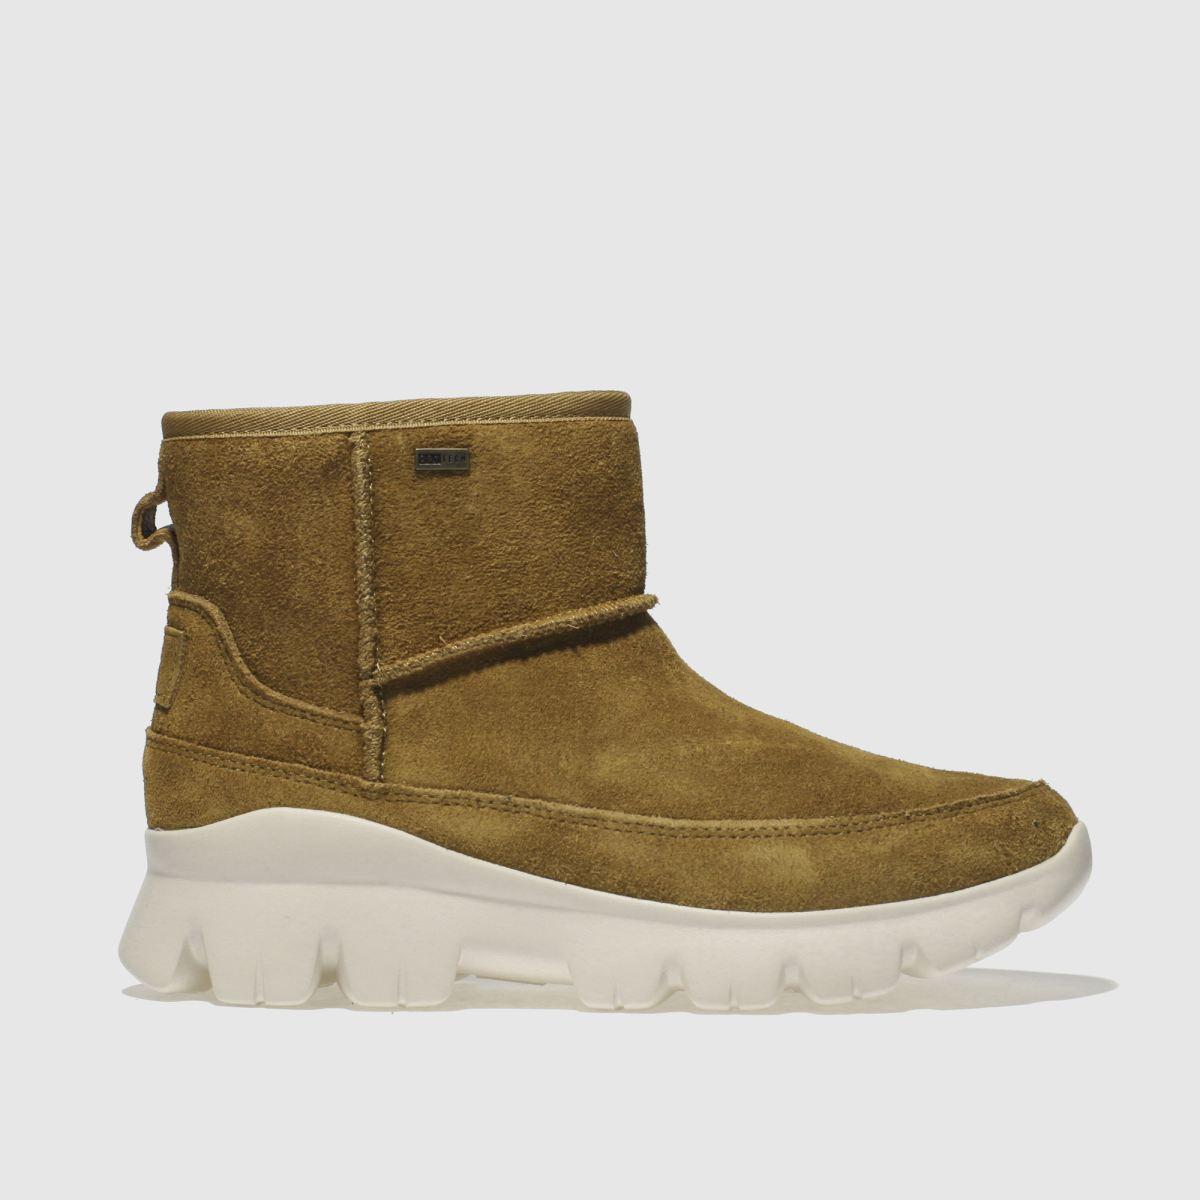 Ugg Tan Palomar Sneaker Boots